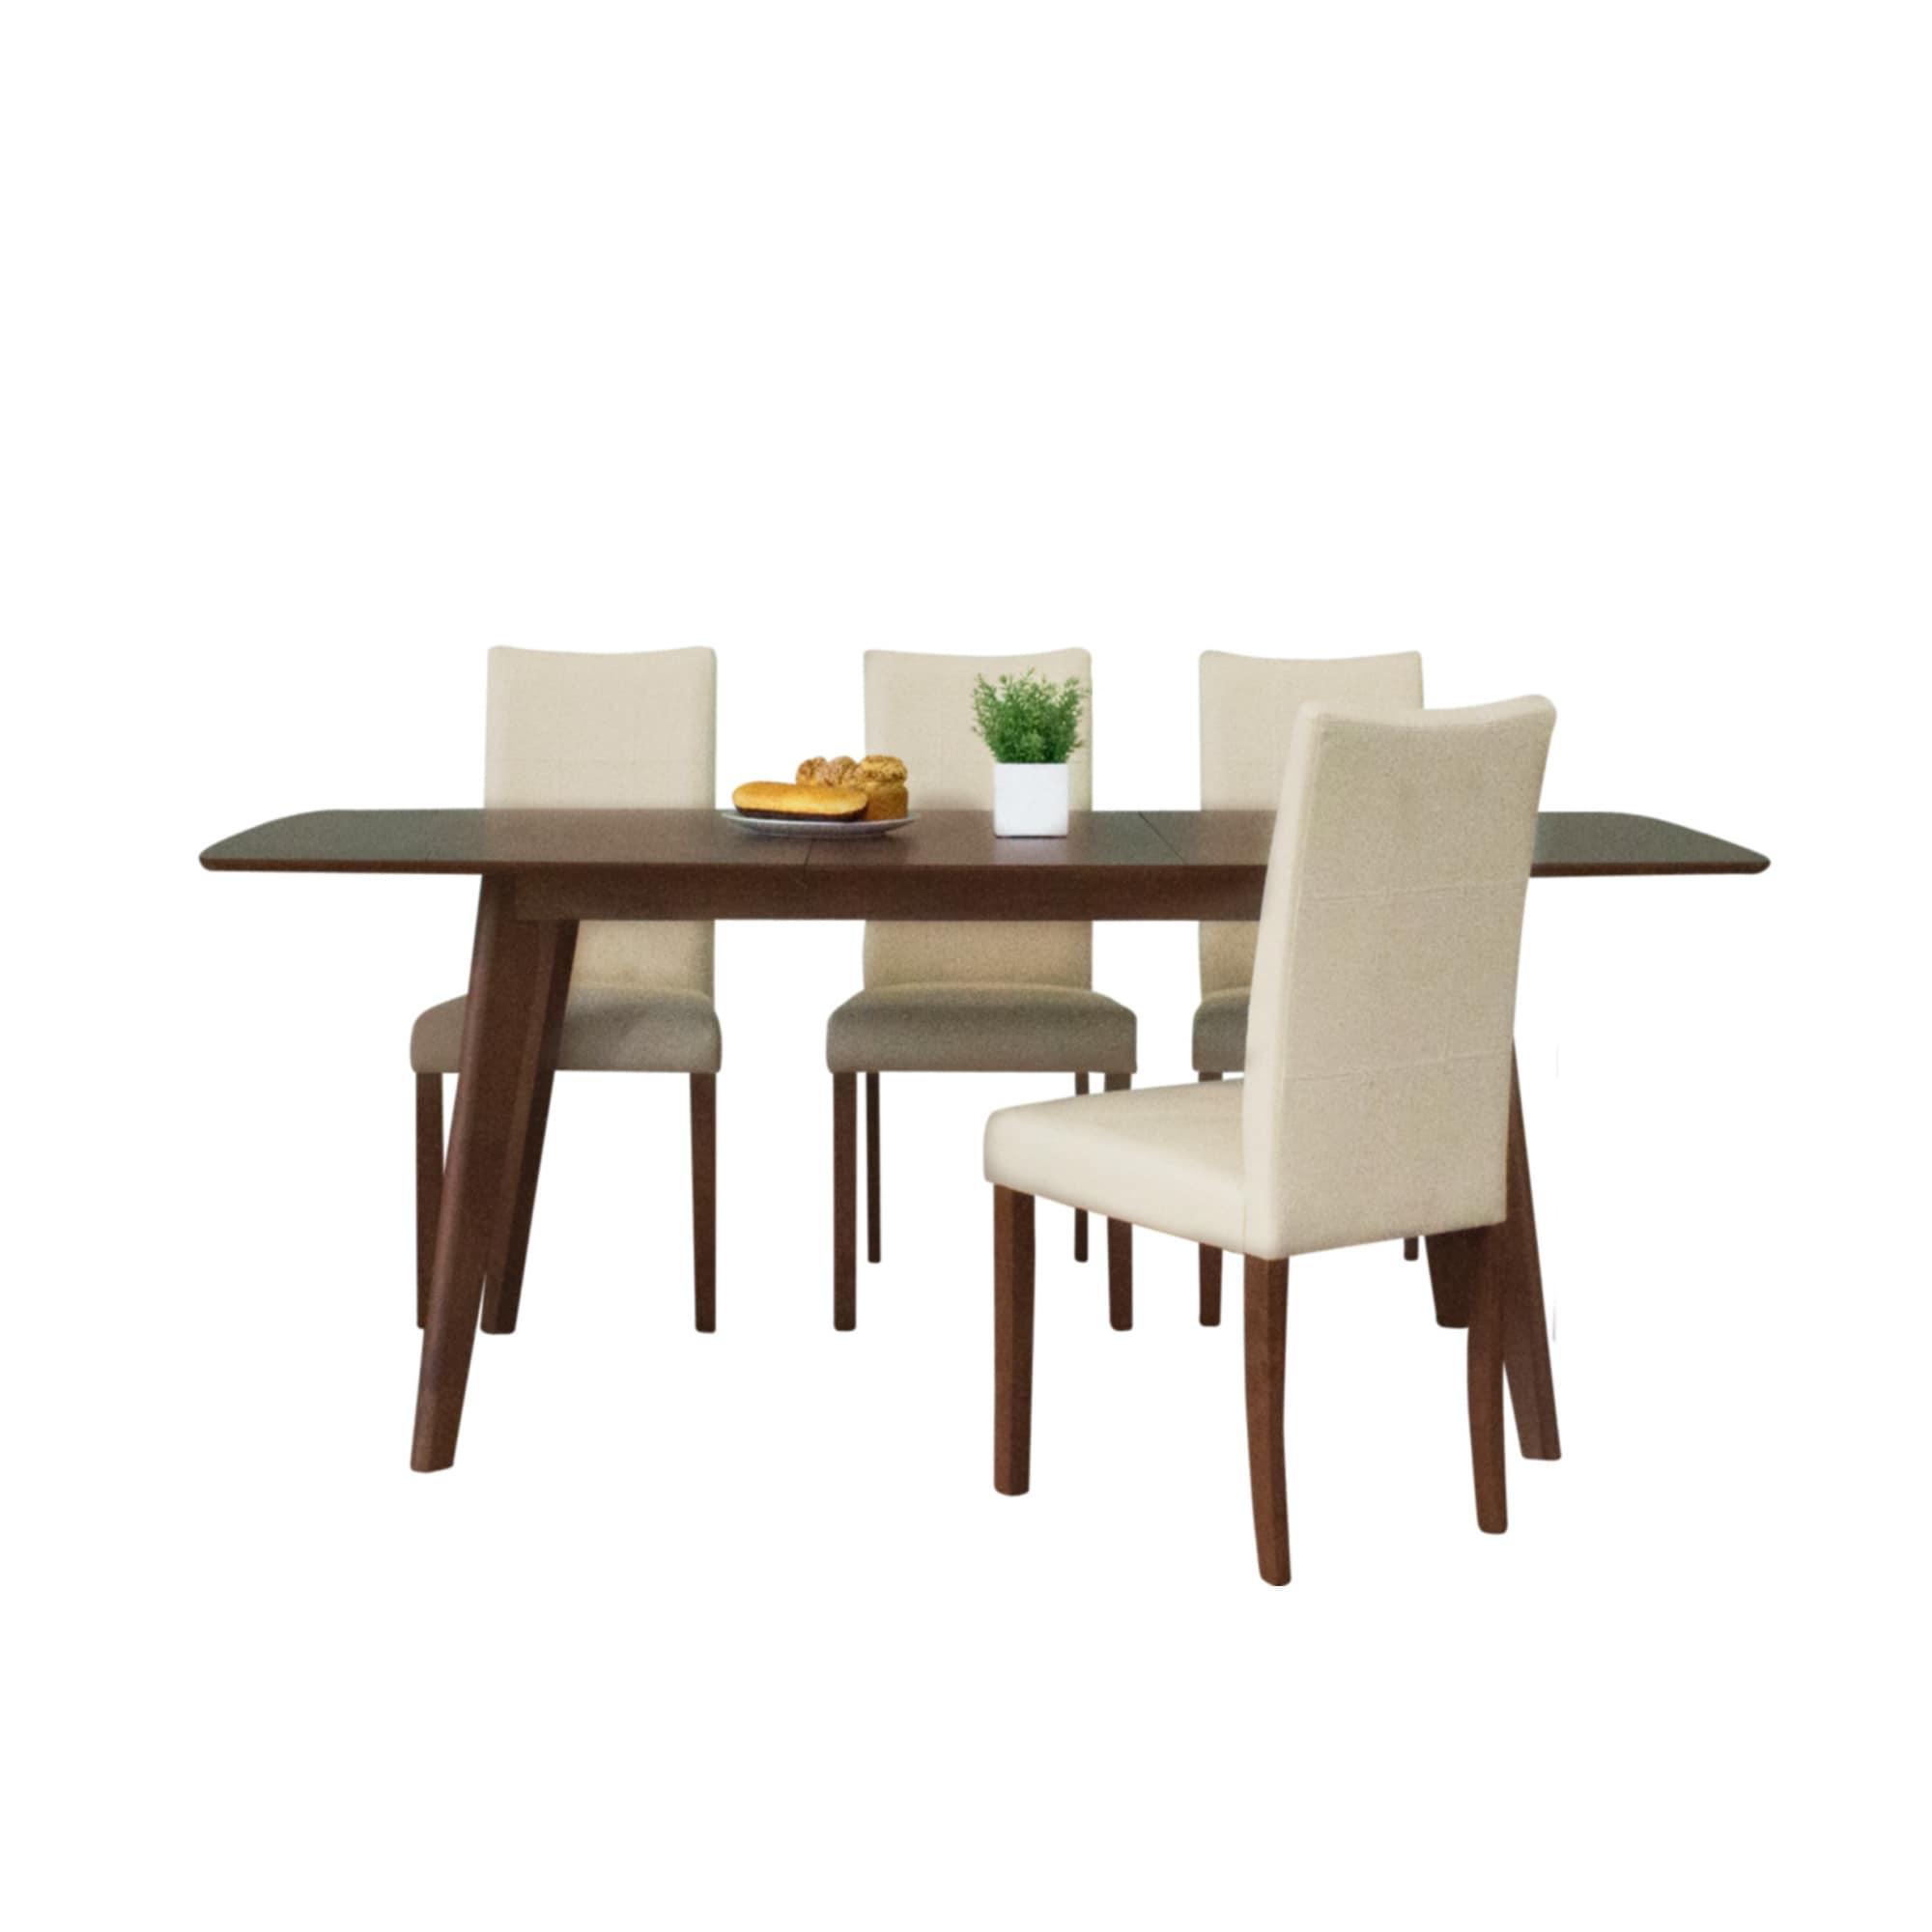 Tatiana Mid-Century 5 Piece Living Room Dining Set, Cream Leather ...